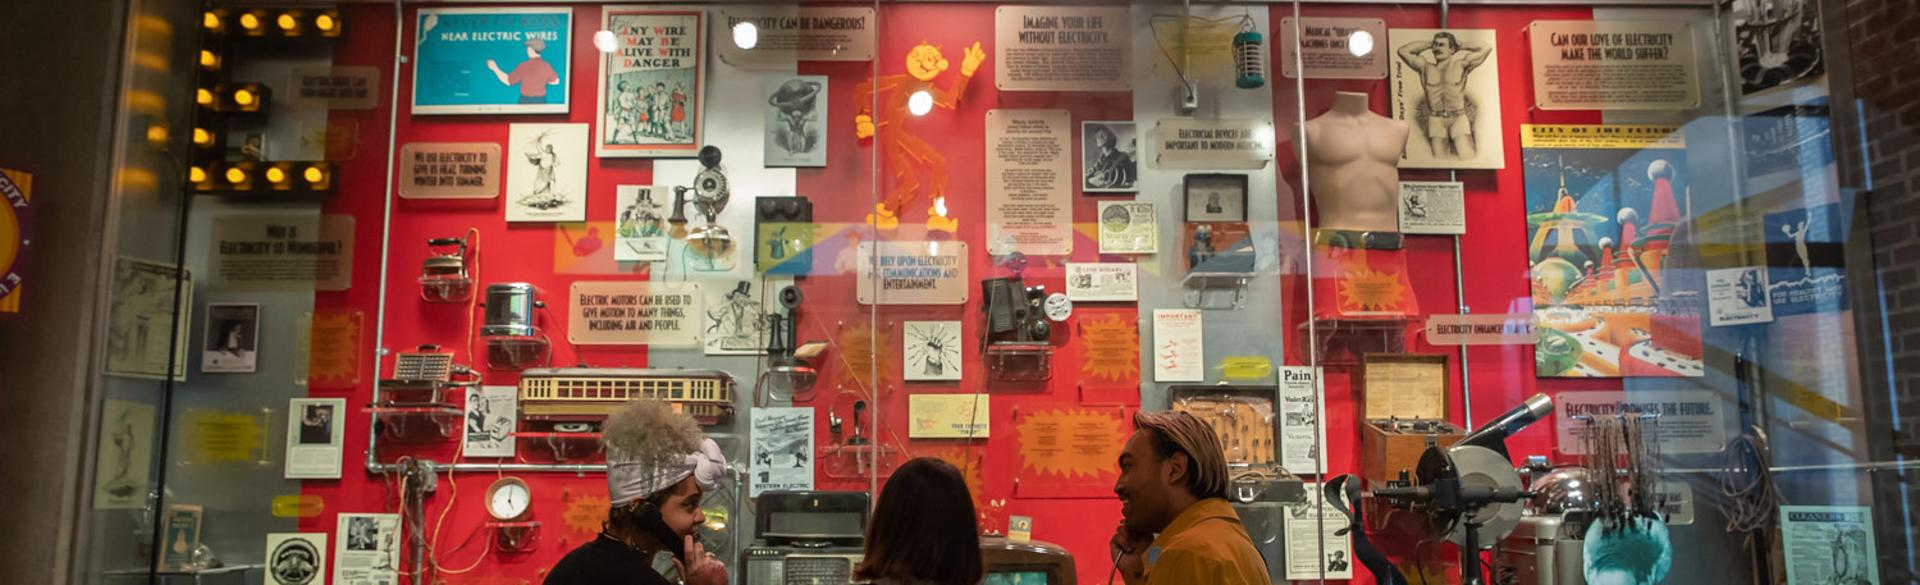 Visitors to the Grand Rapids Public Museum